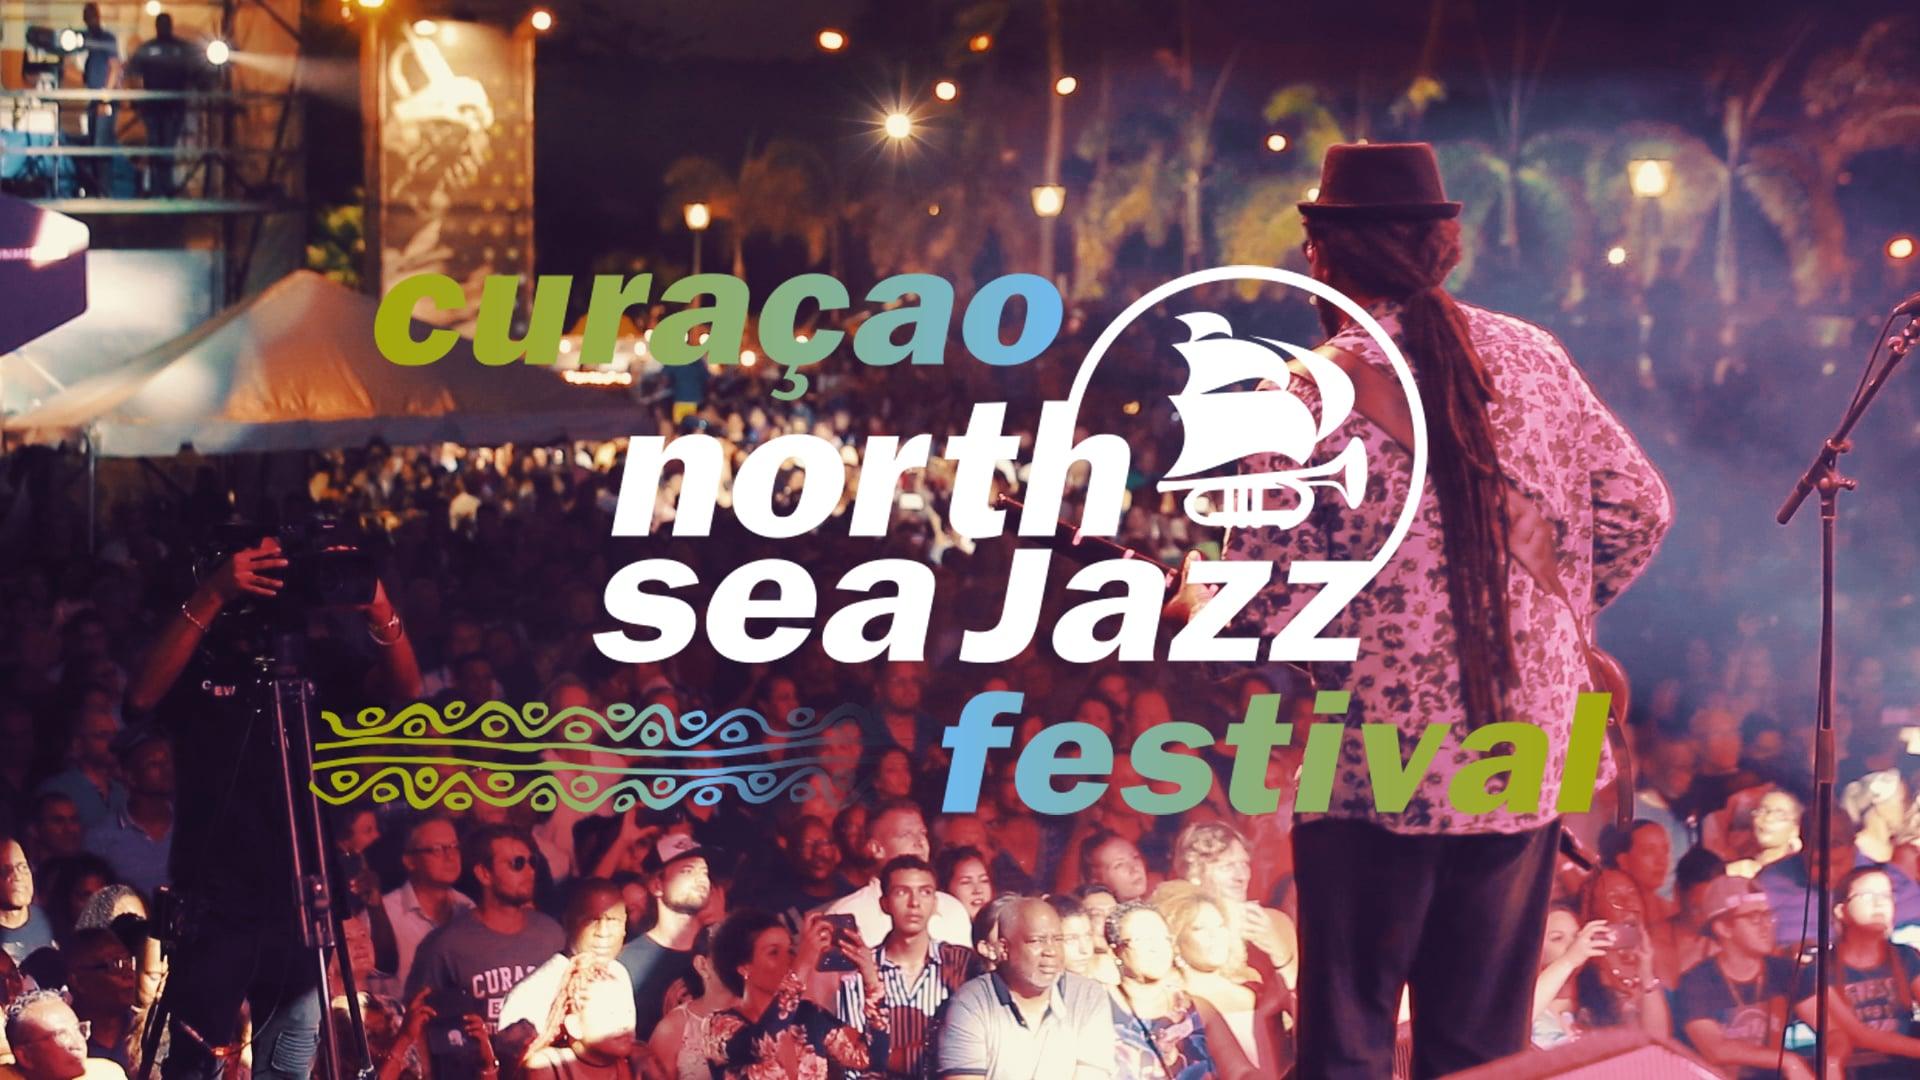 Curacao North Sea Jazz Event Video